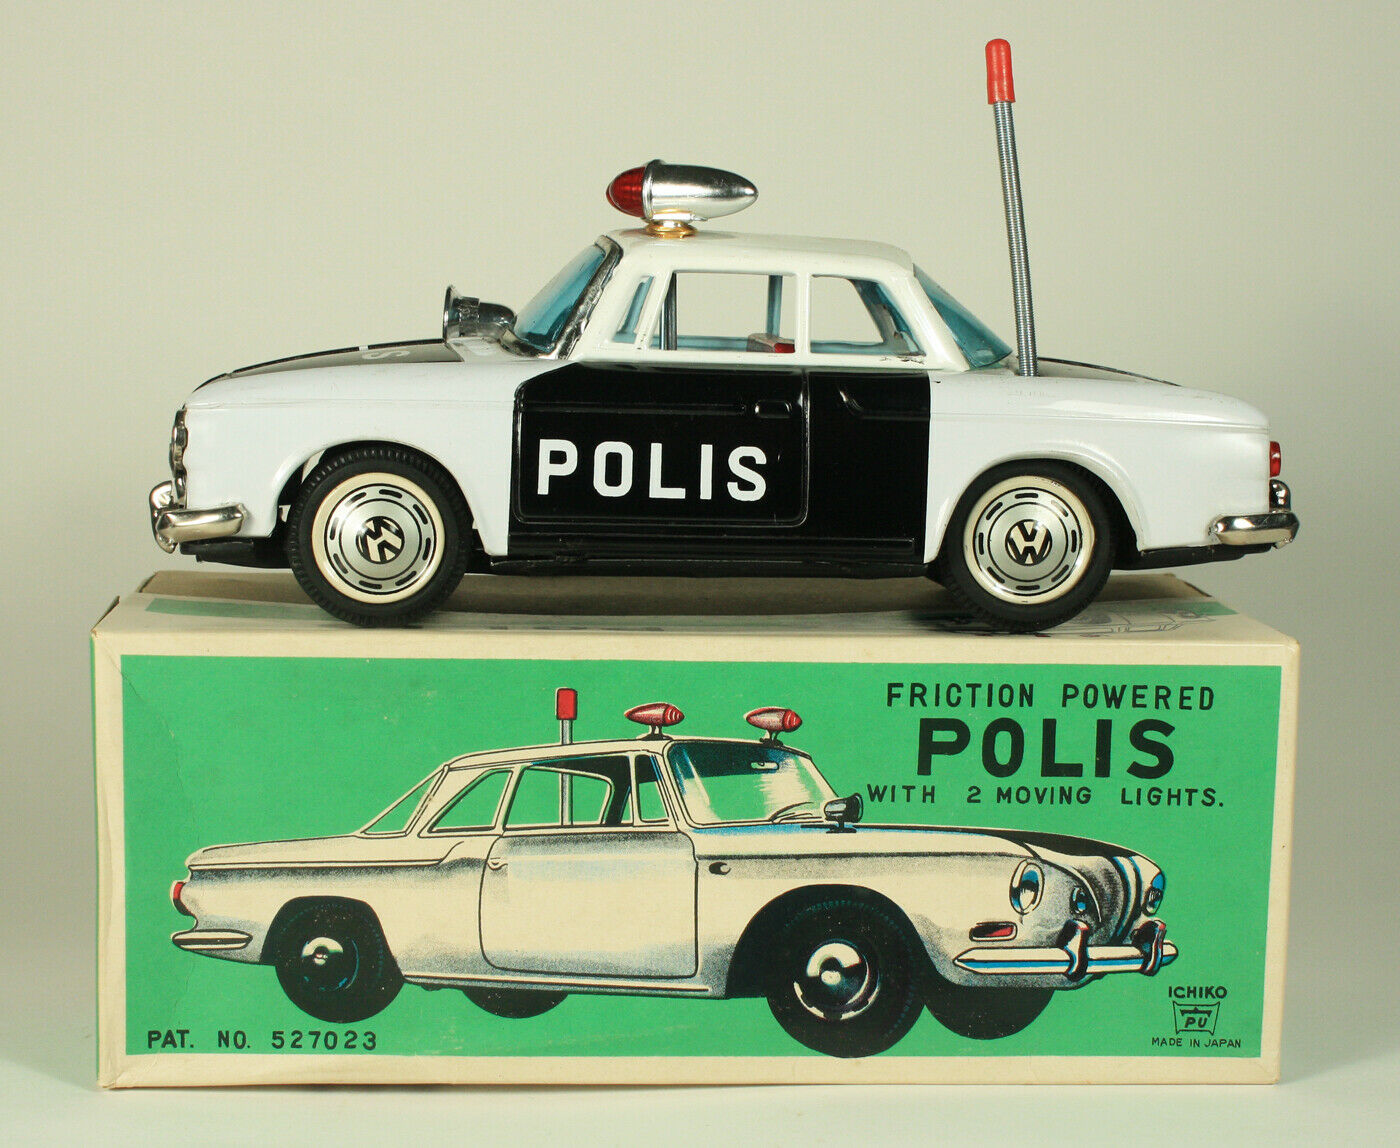 Una patrulla popular. Nmib, Nmib, Nmib, Japón. 4bf